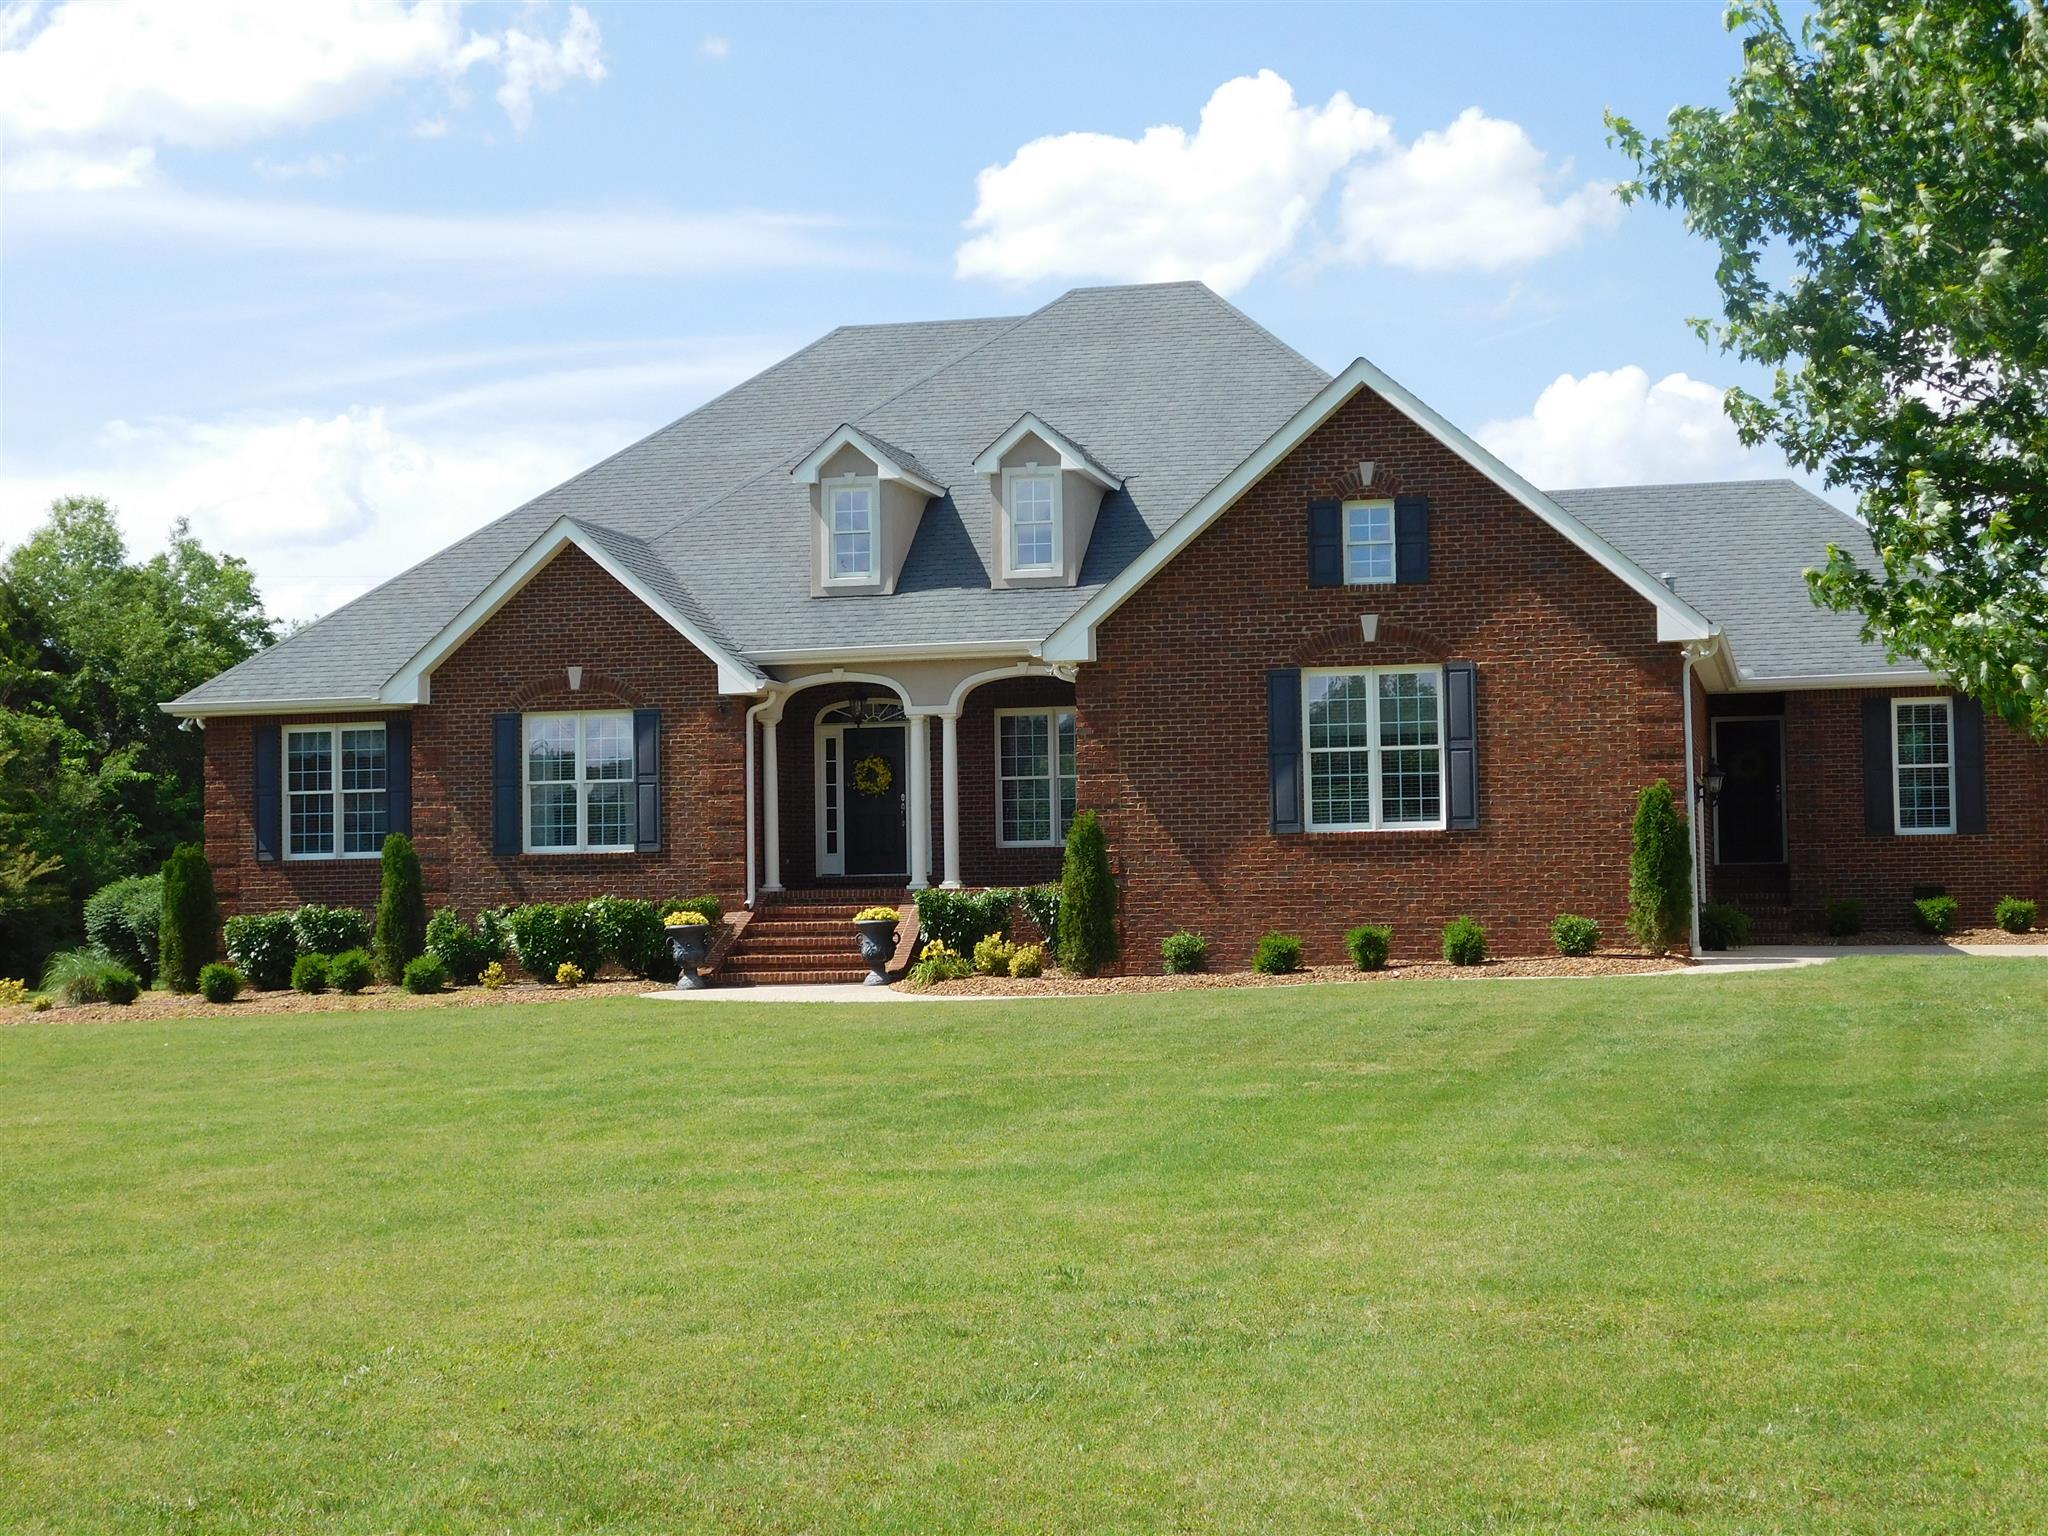 3539 Old Rome Pike, Lebanon, TN 37087 - Lebanon, TN real estate listing